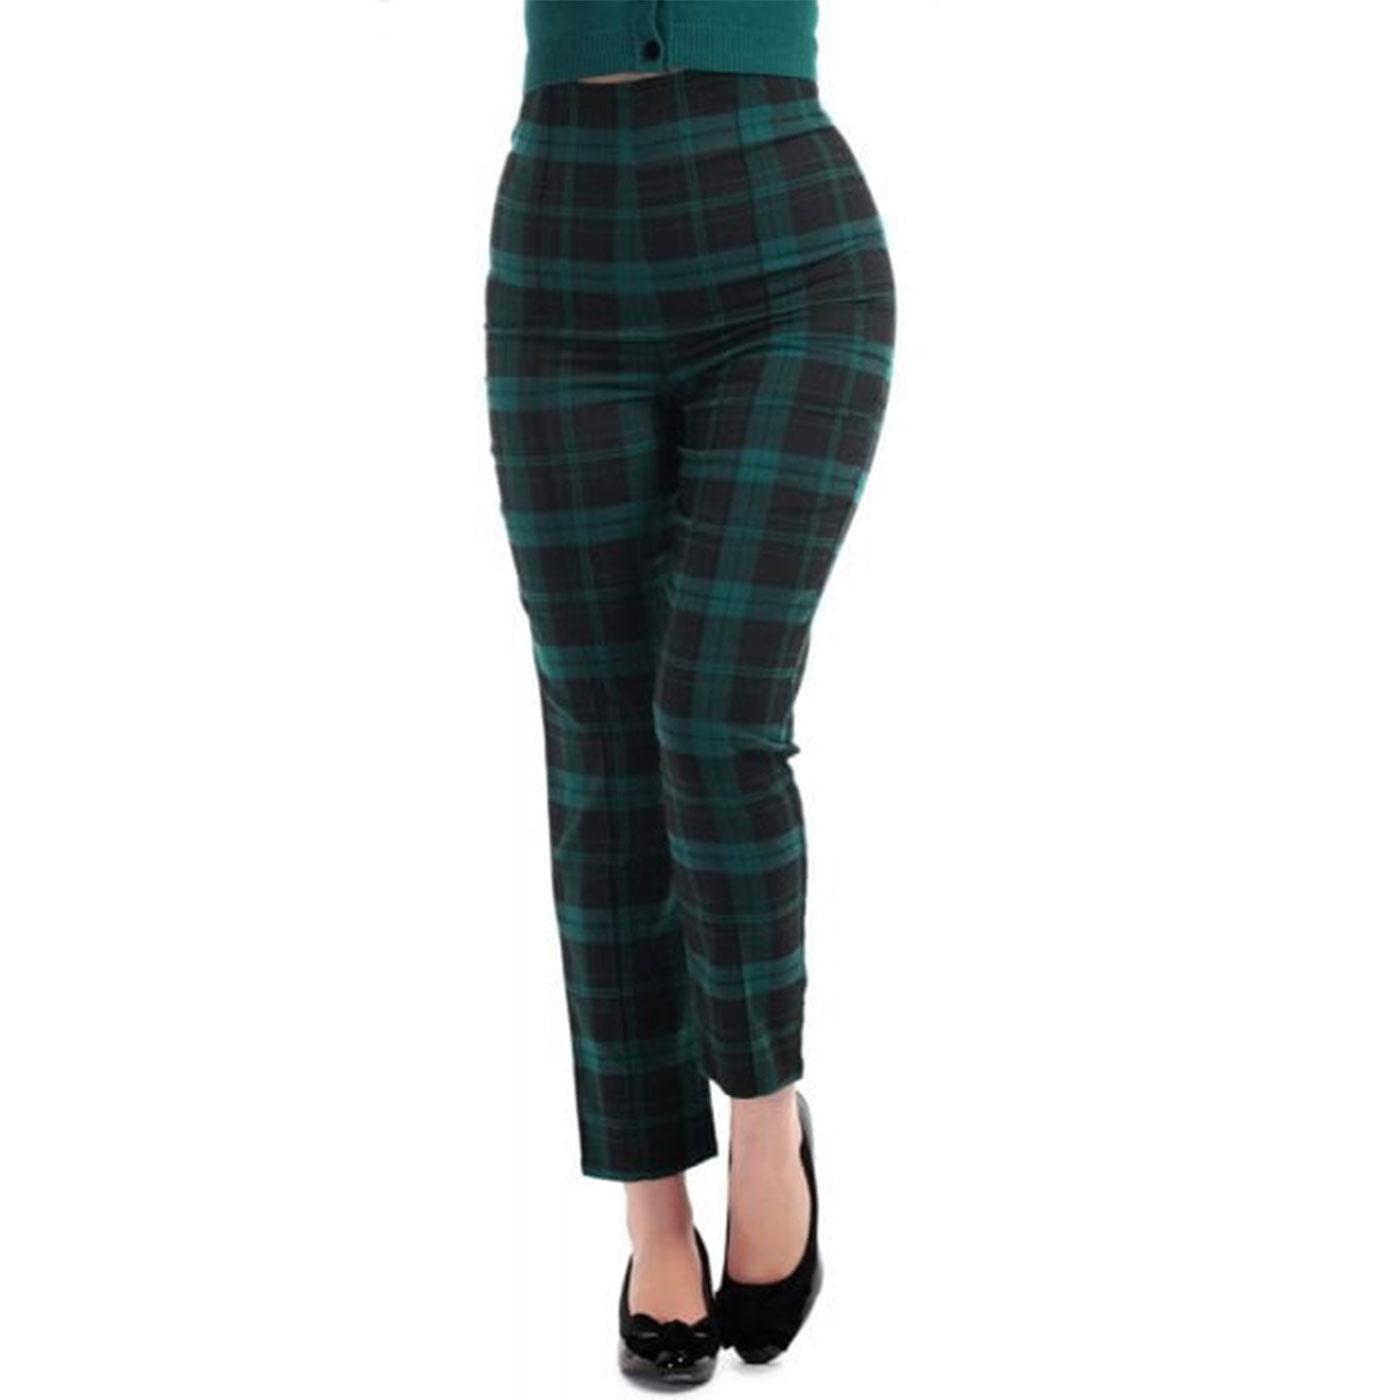 Bonnie COLLECTIF Tartan Check Cigarette Trousers